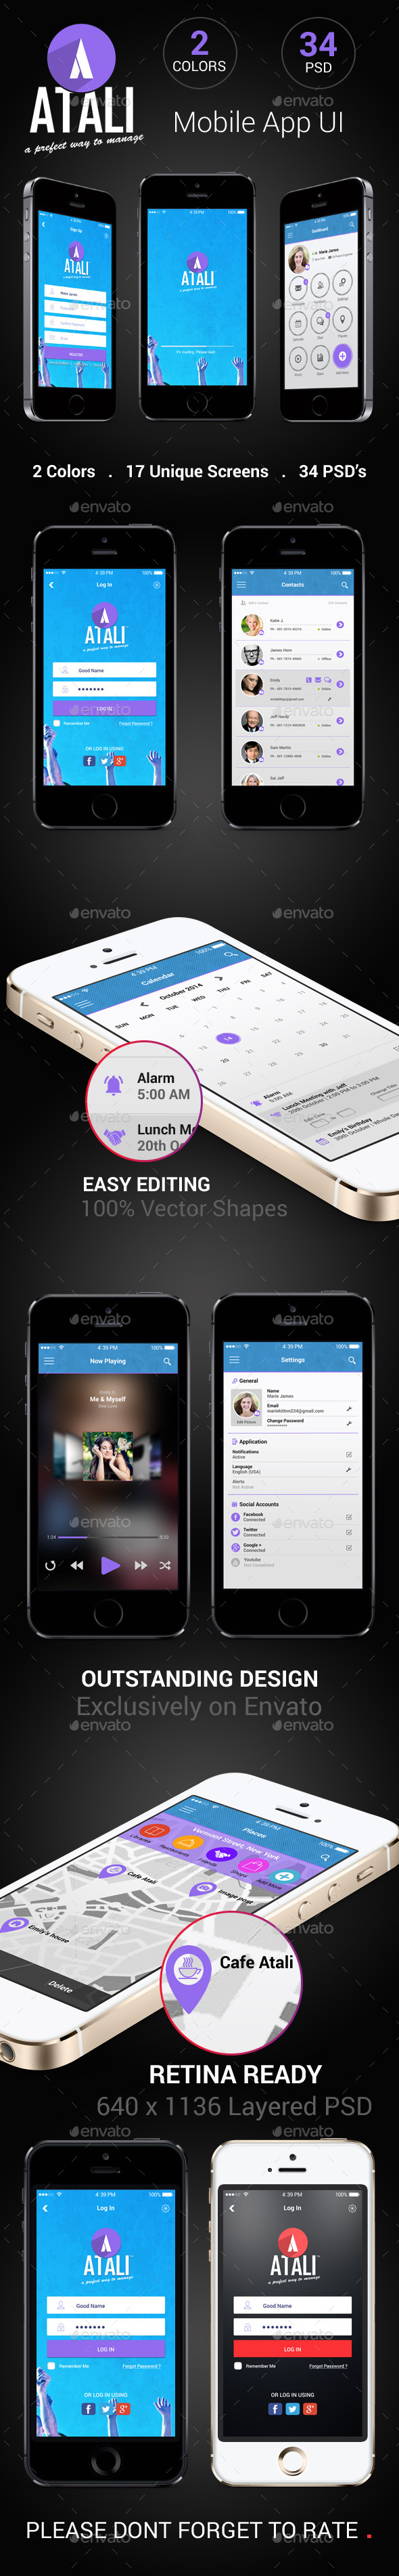 GraphicRiver Atali Mobile App UI 9225658